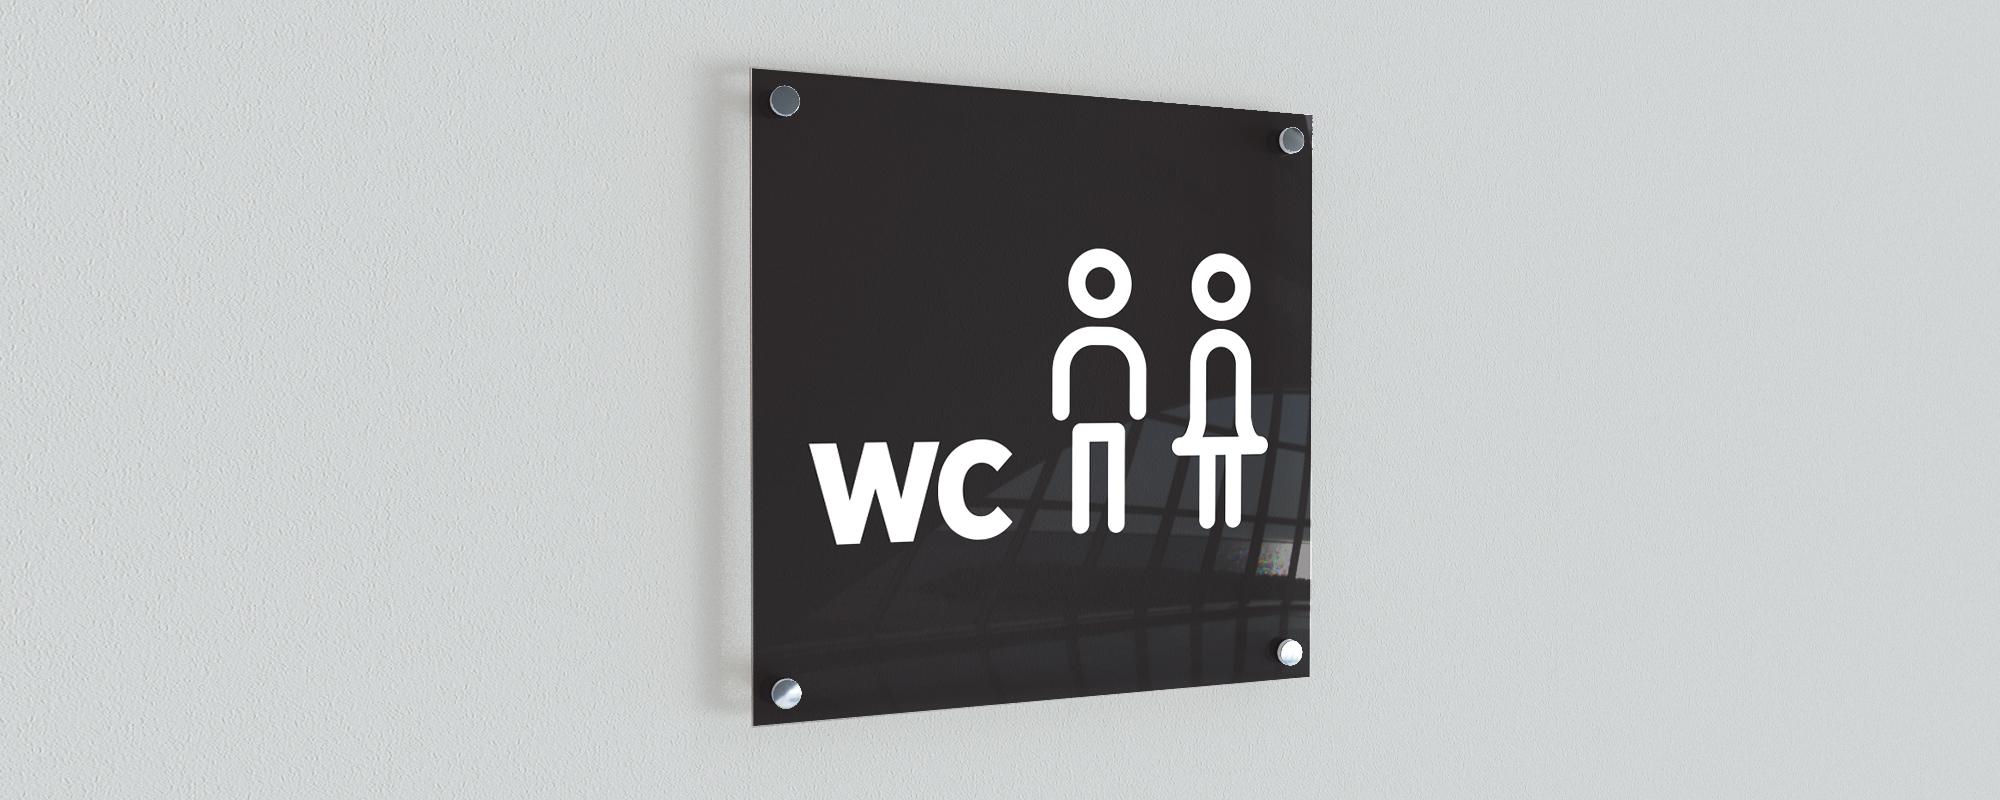 Wc_table.jpg